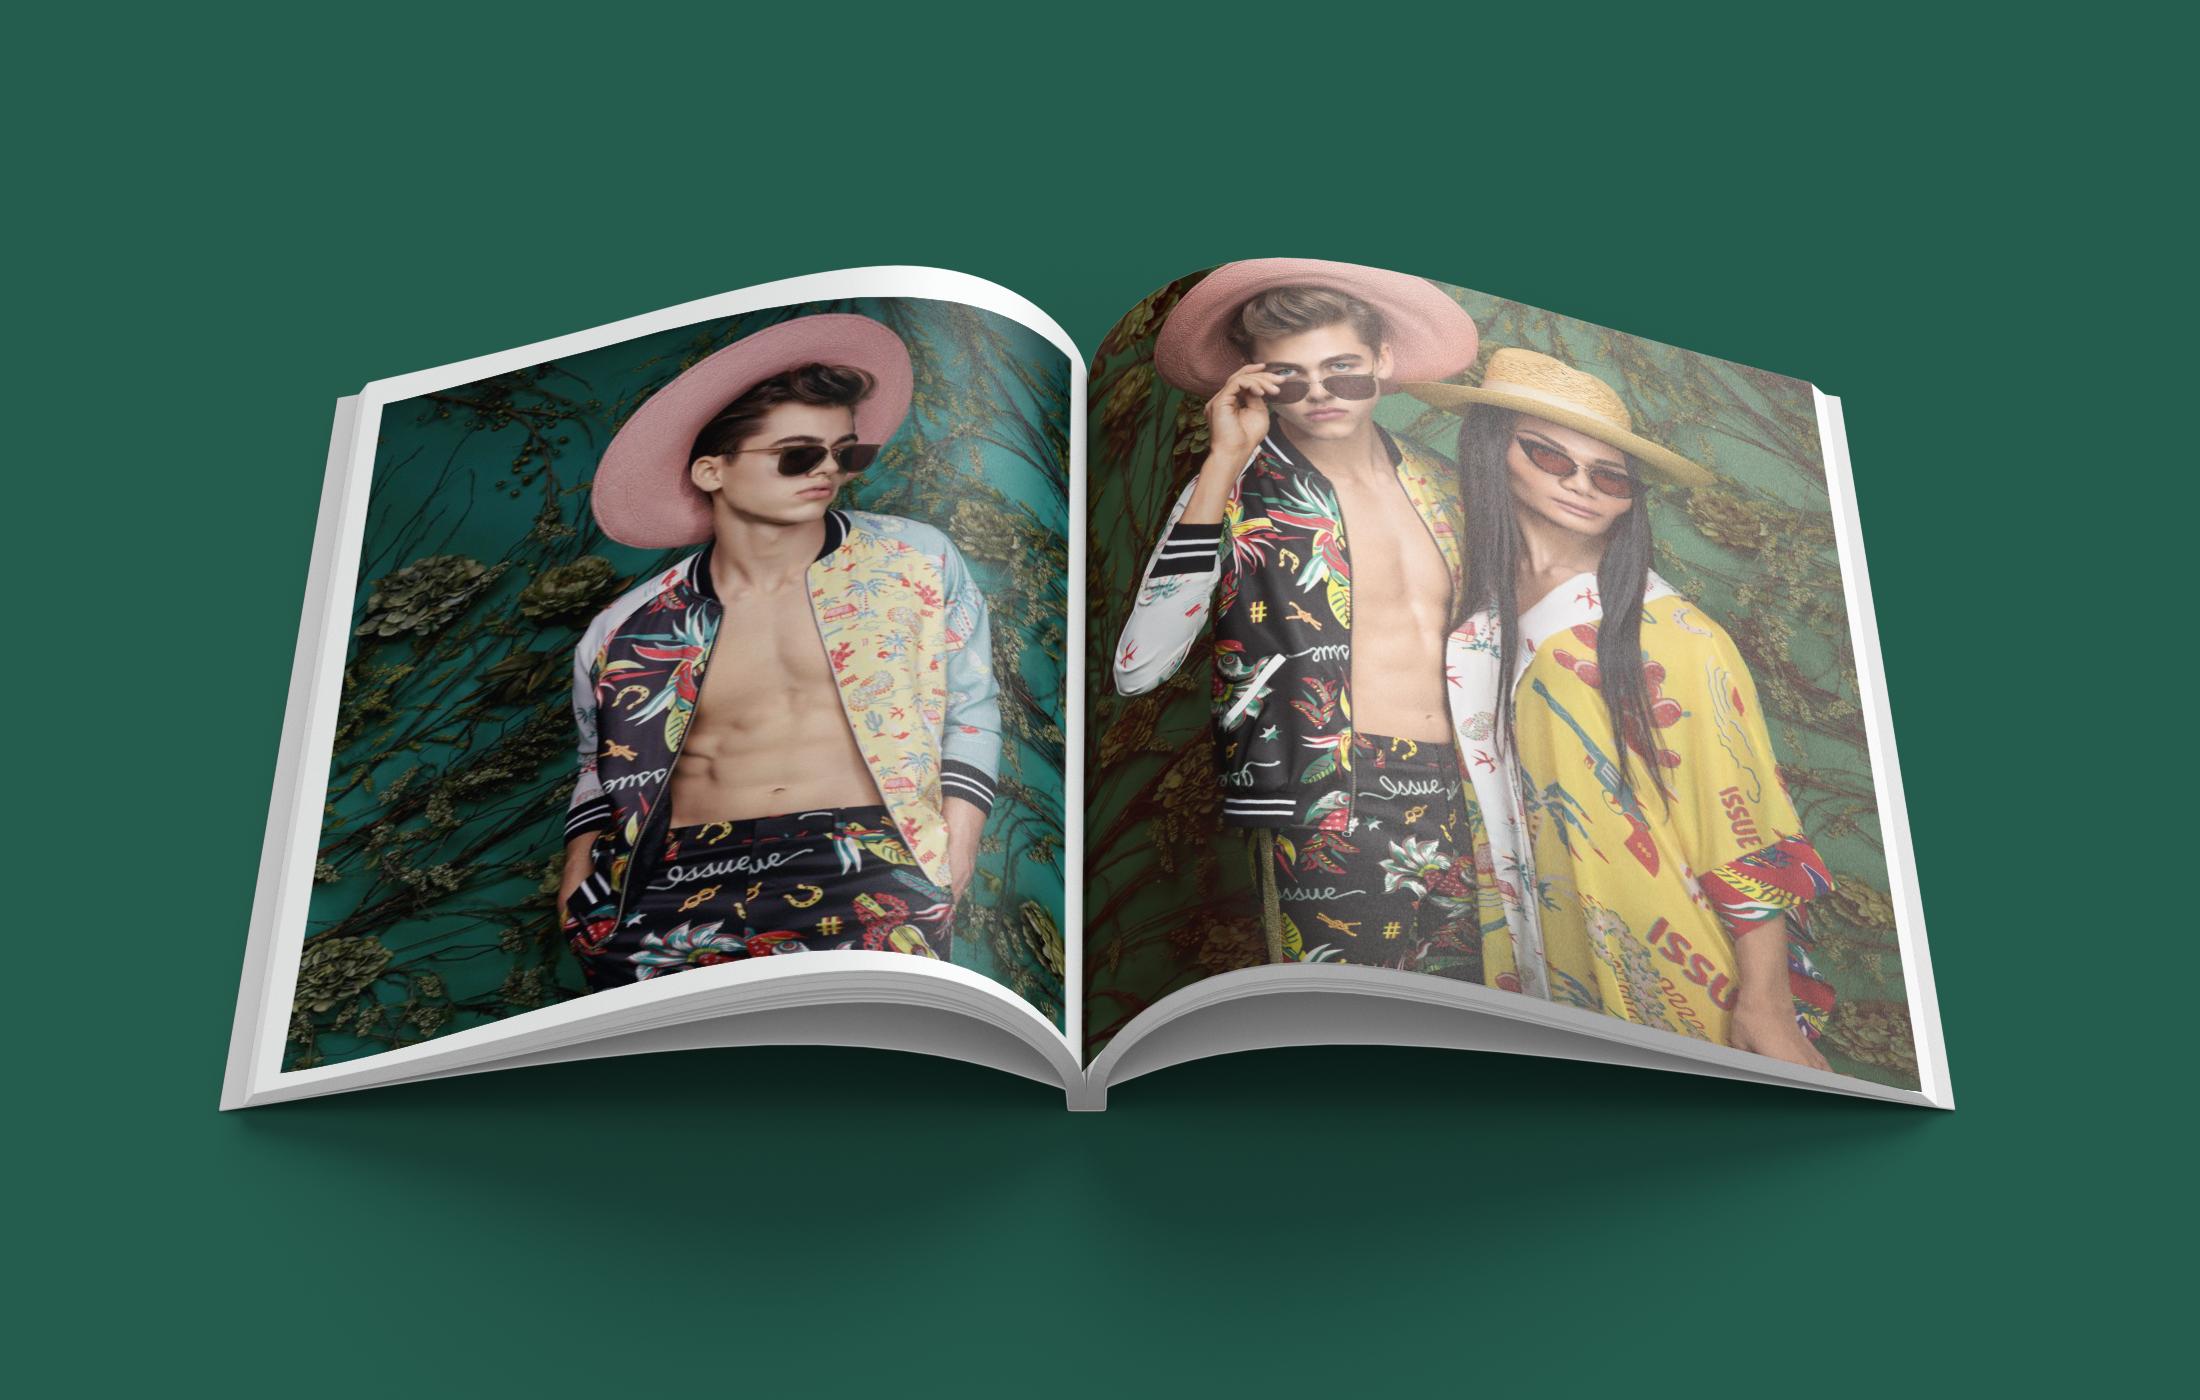 Model Citizen Magazine Issue 35, Macky Suson, Fashion Inclusion Now4.png